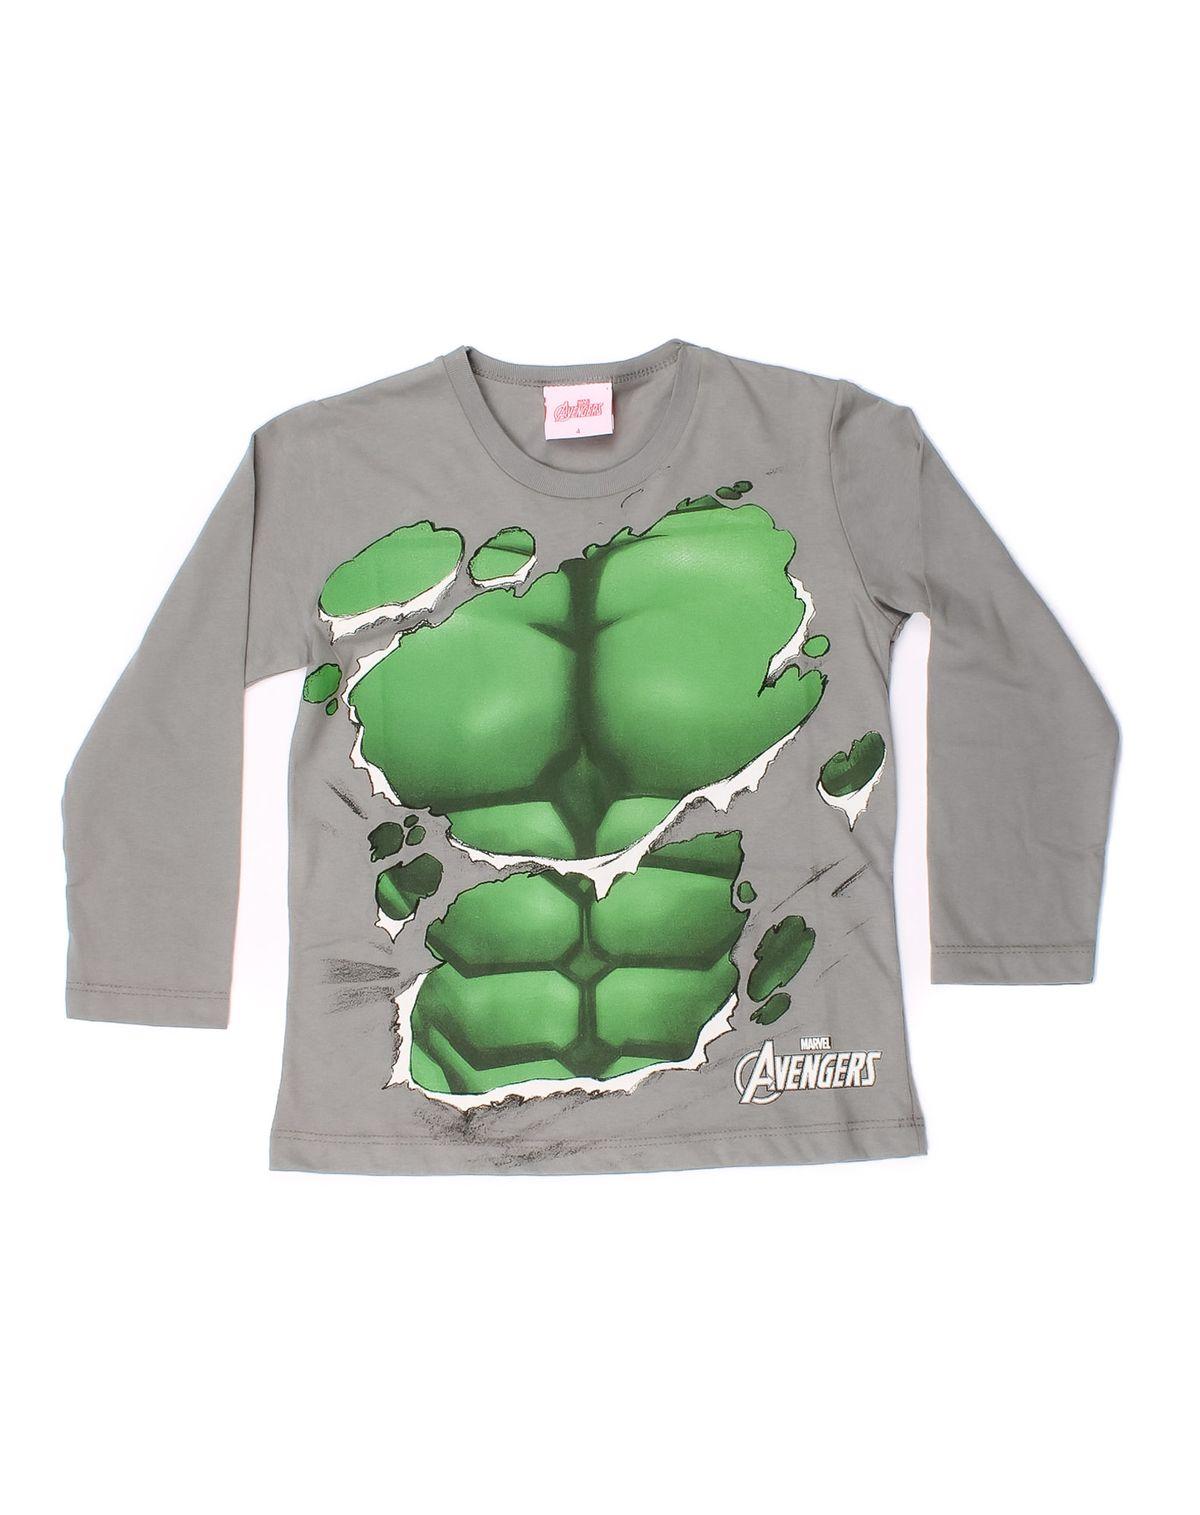 552166003-camiseta-manga-longa-infantil-menino-hulk-chumbo-8-b6f